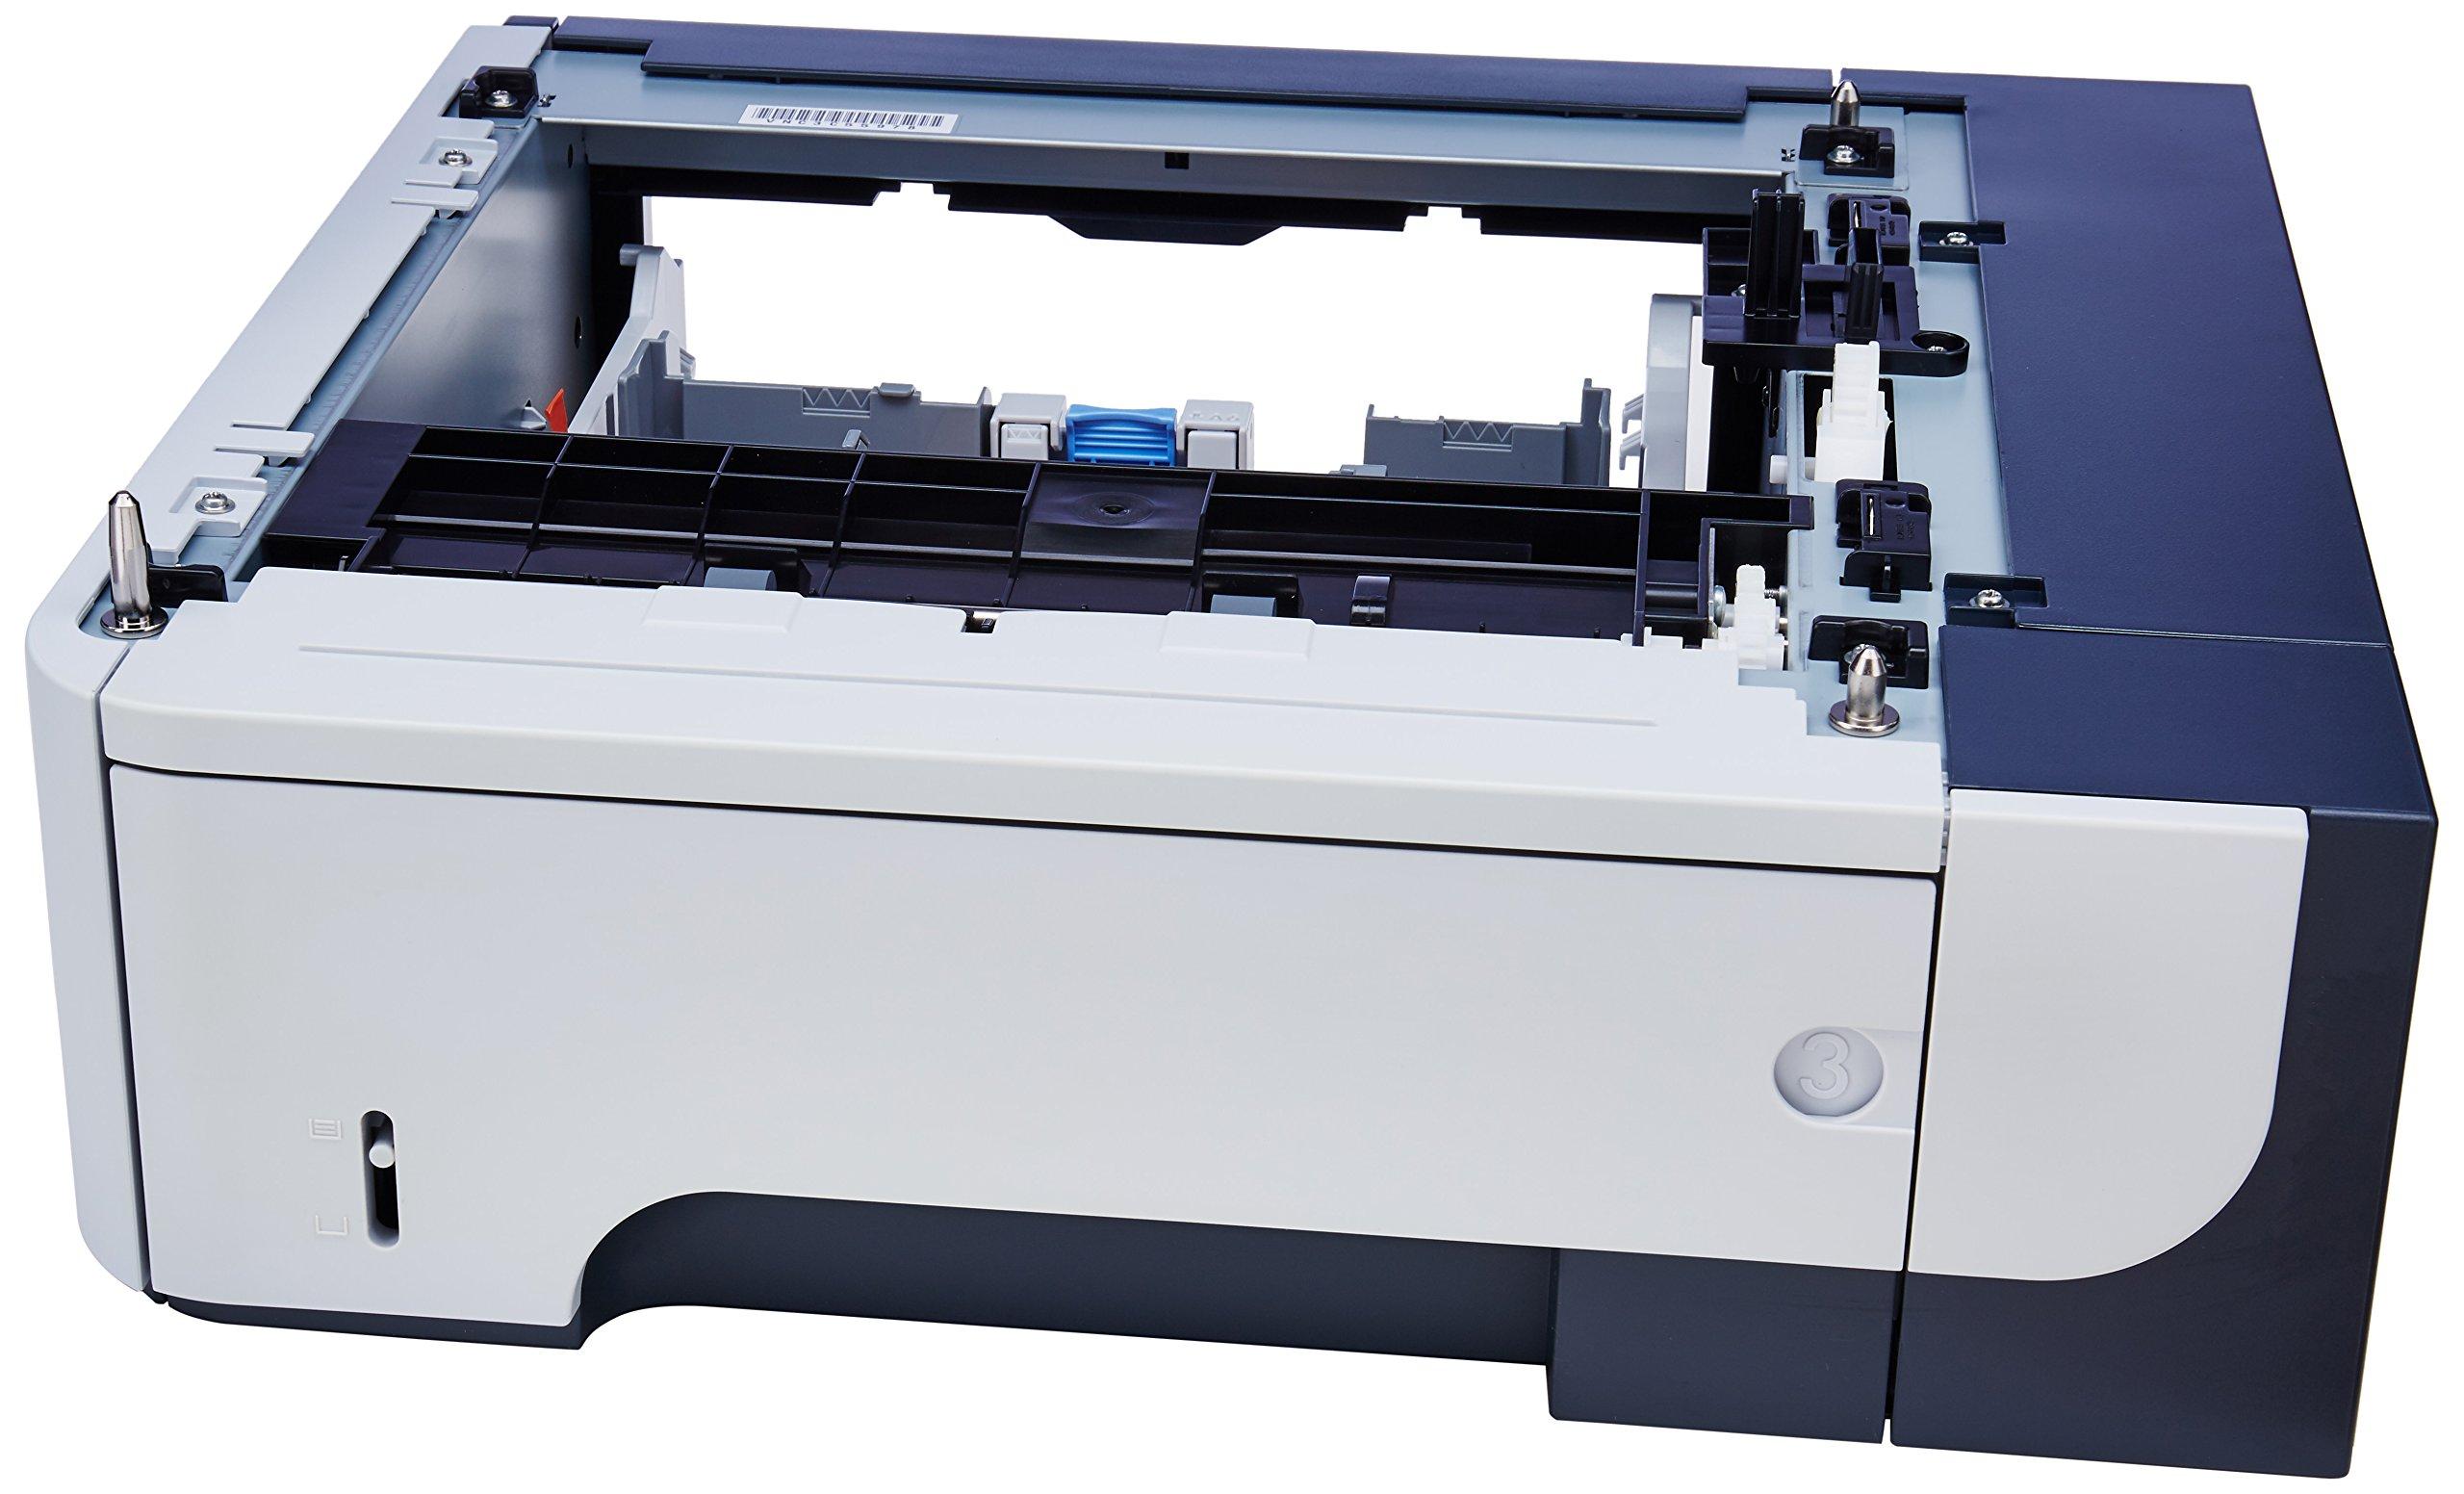 500-SHEET Laserjet Tray CE530A by HP